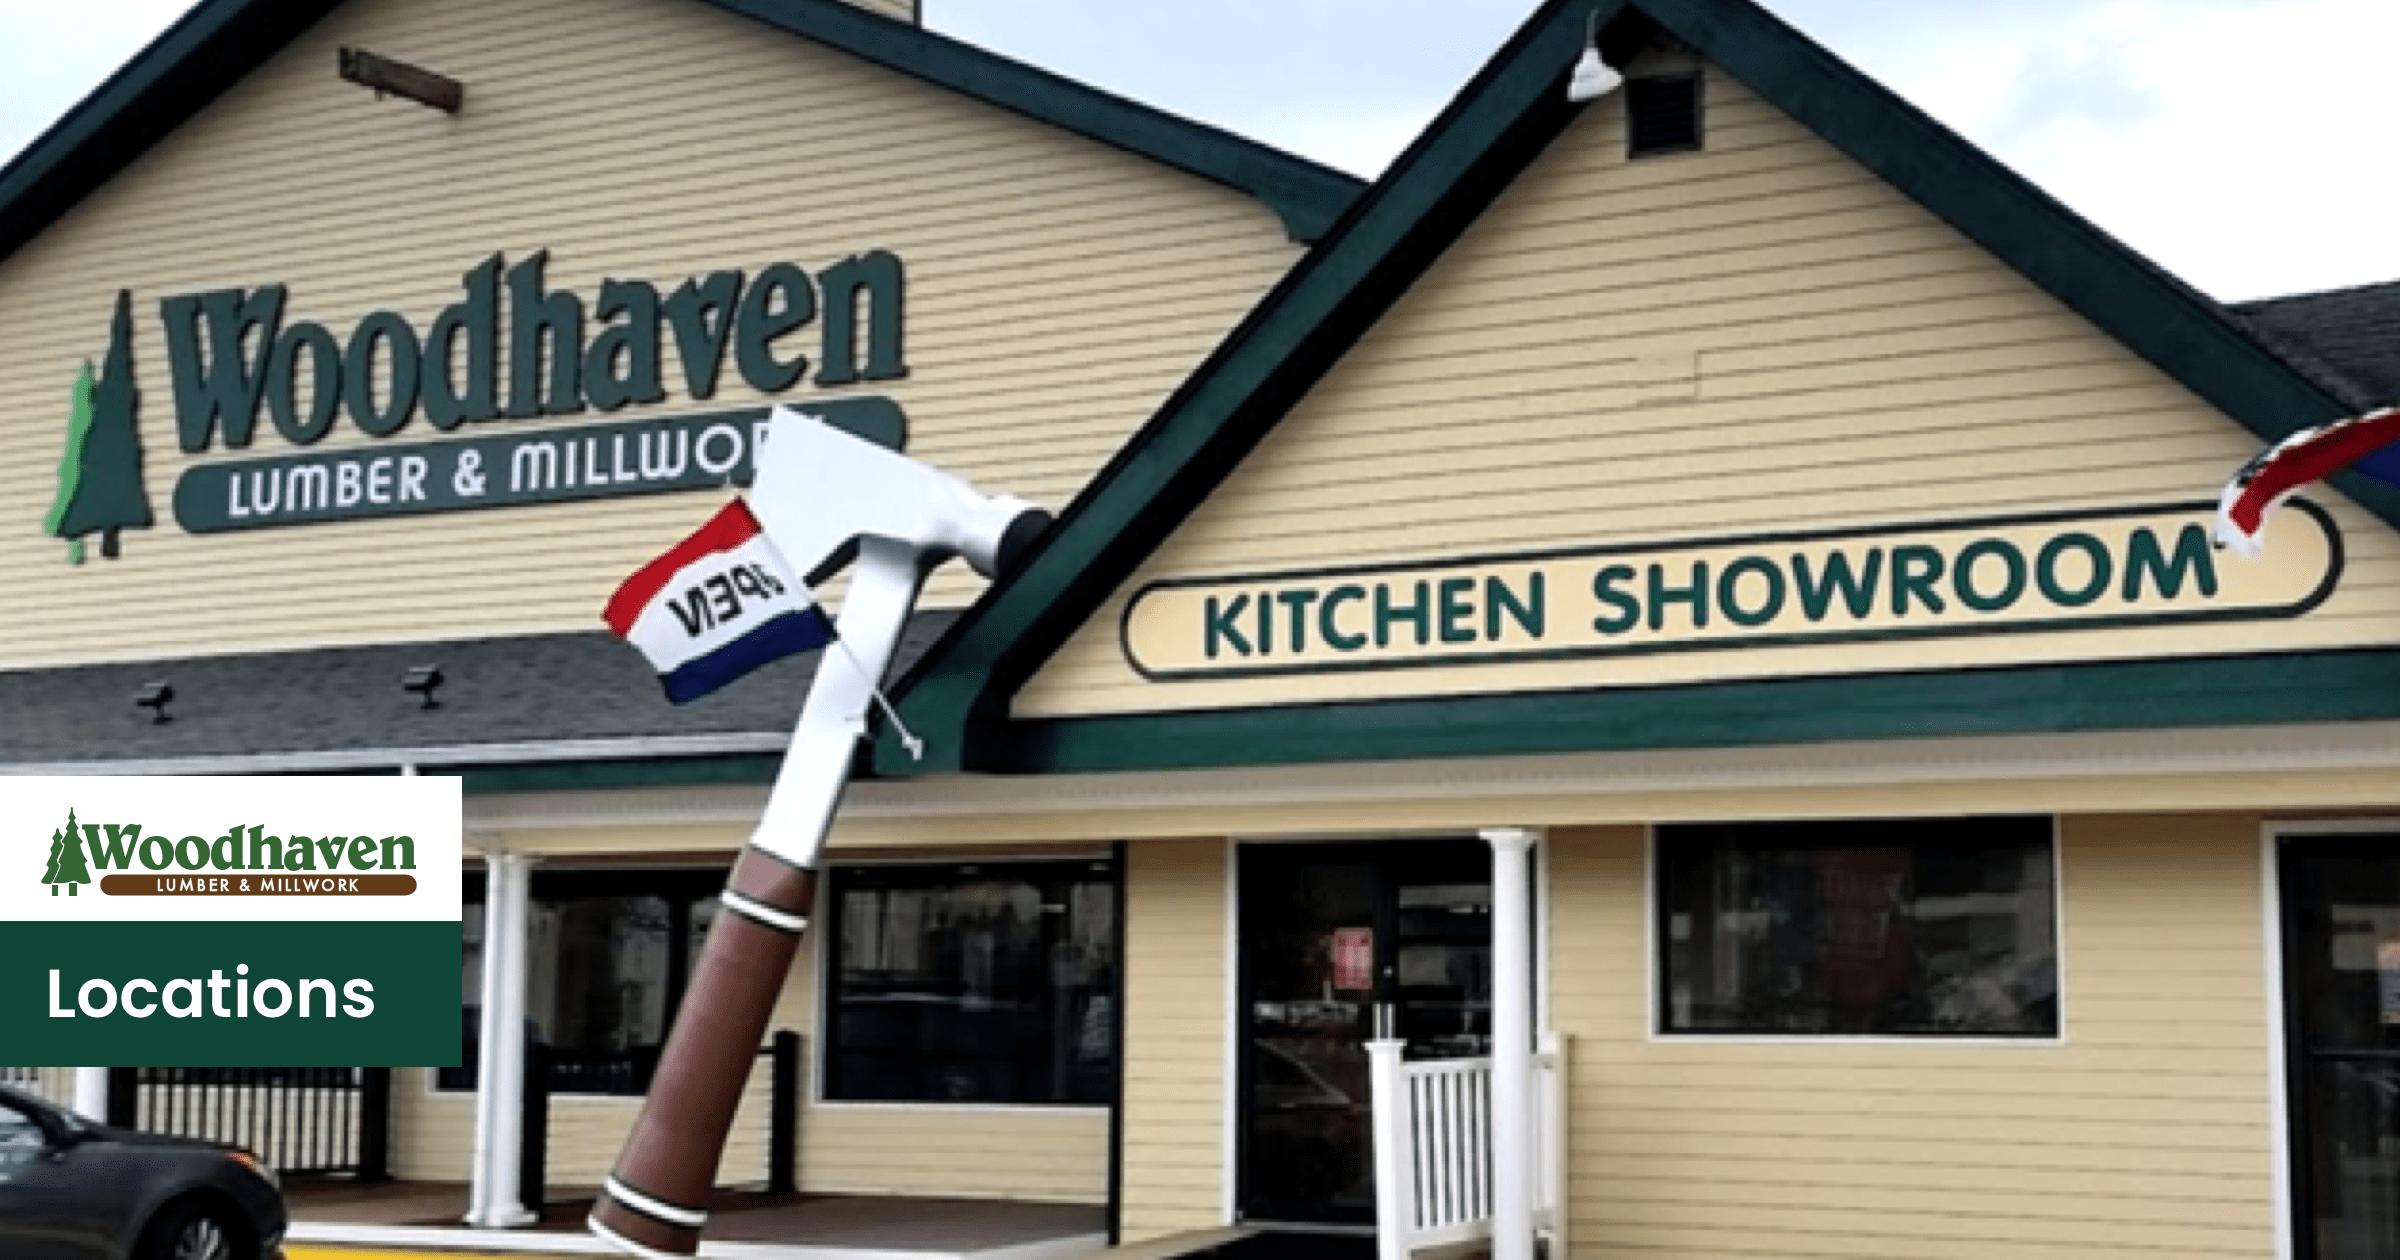 Woodhaven kitchens lakewood nj cabinets matttroy for Bathroom vanities lakewood nj